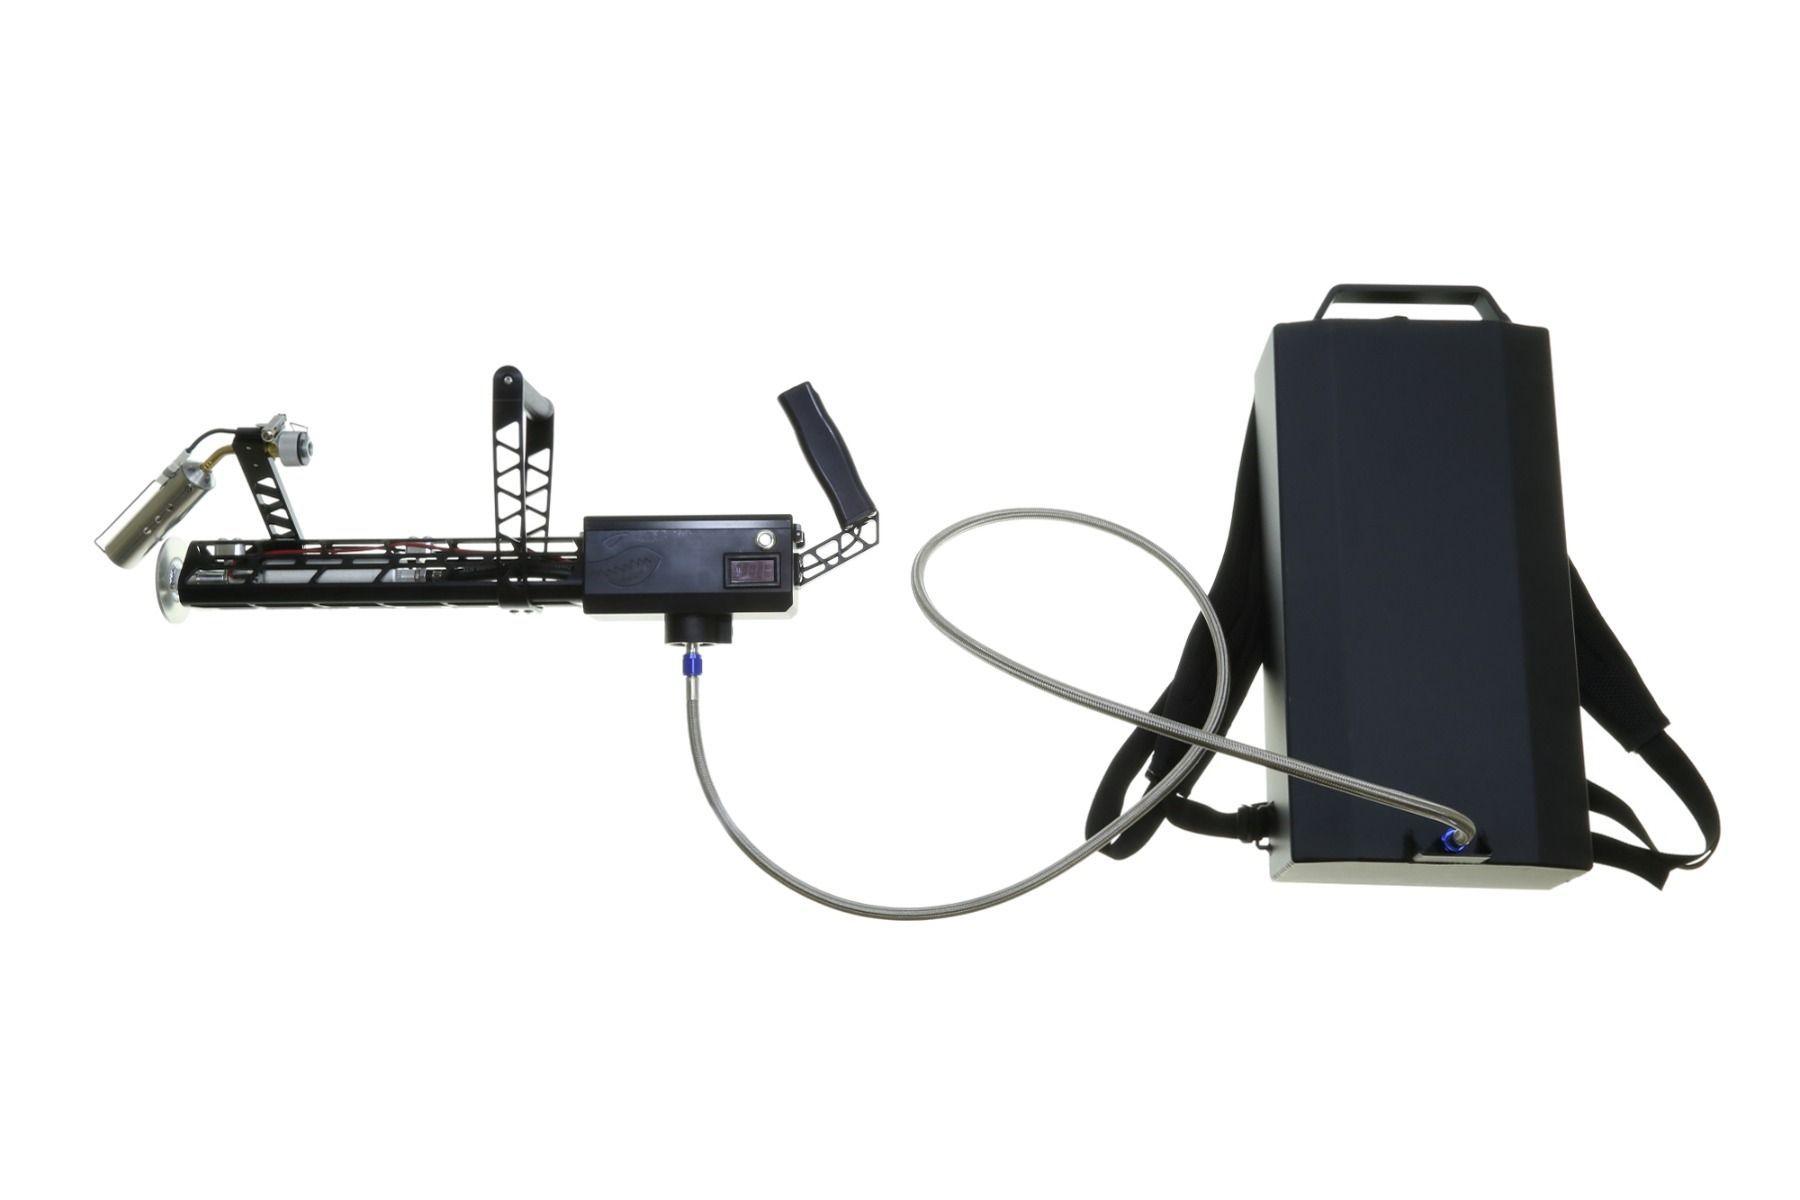 XM42-M Flamethrower Modular - Black - Includes Ultralite Backpack - 4